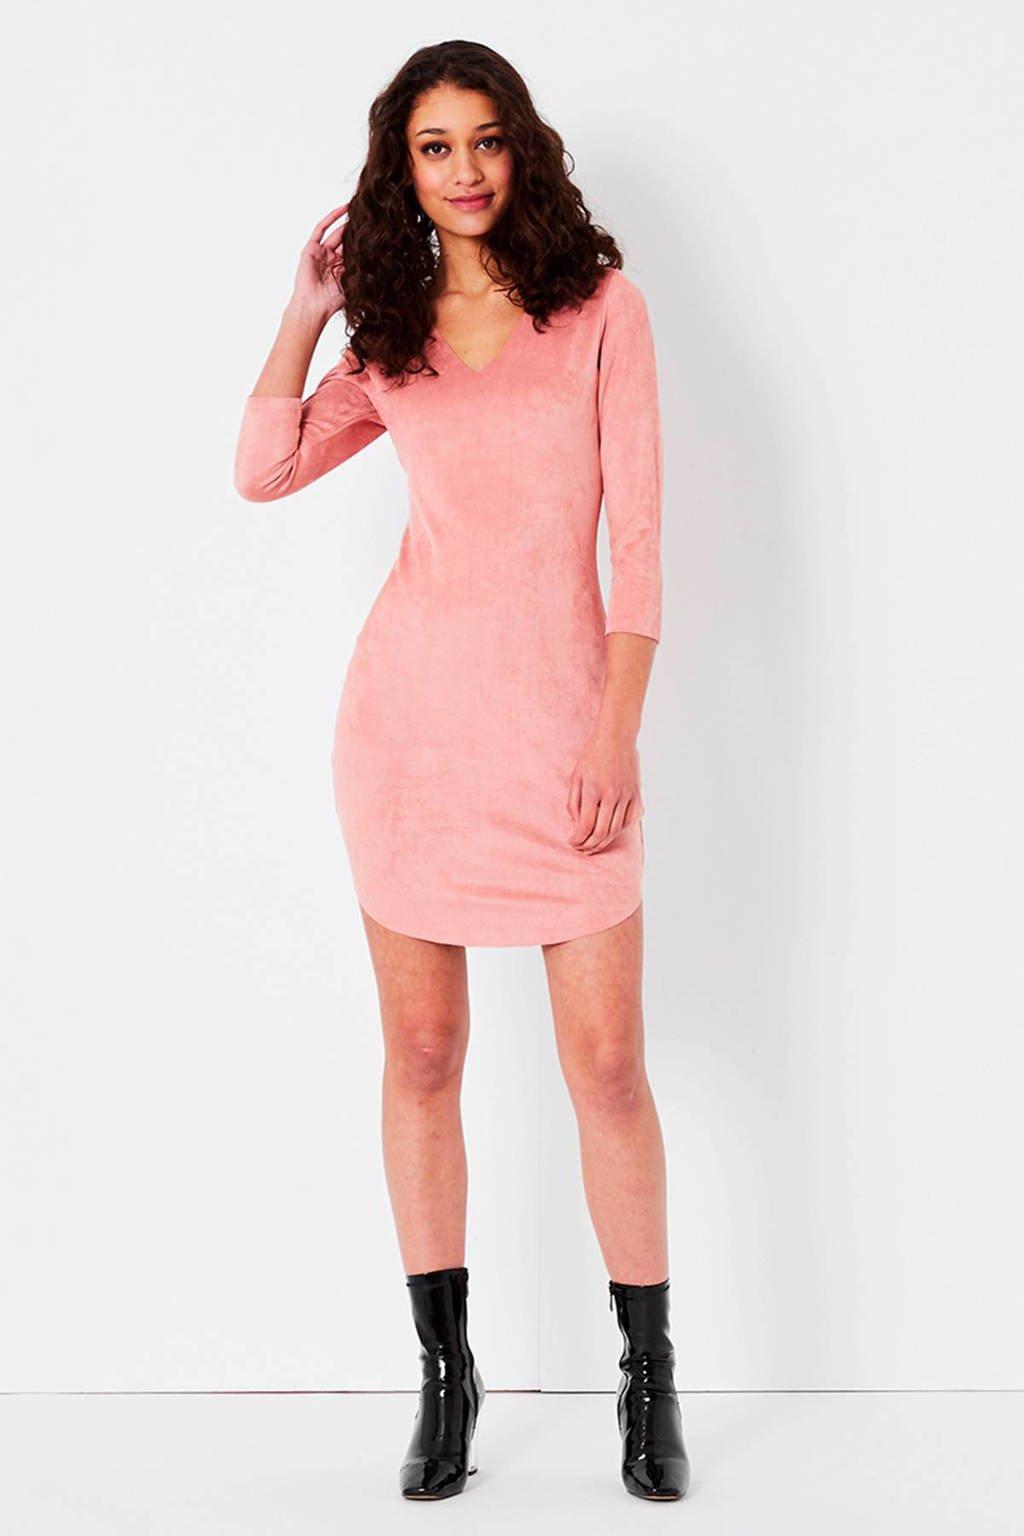 Hedendaags CoolCat suèdine jurk lichtroze | wehkamp GT-65